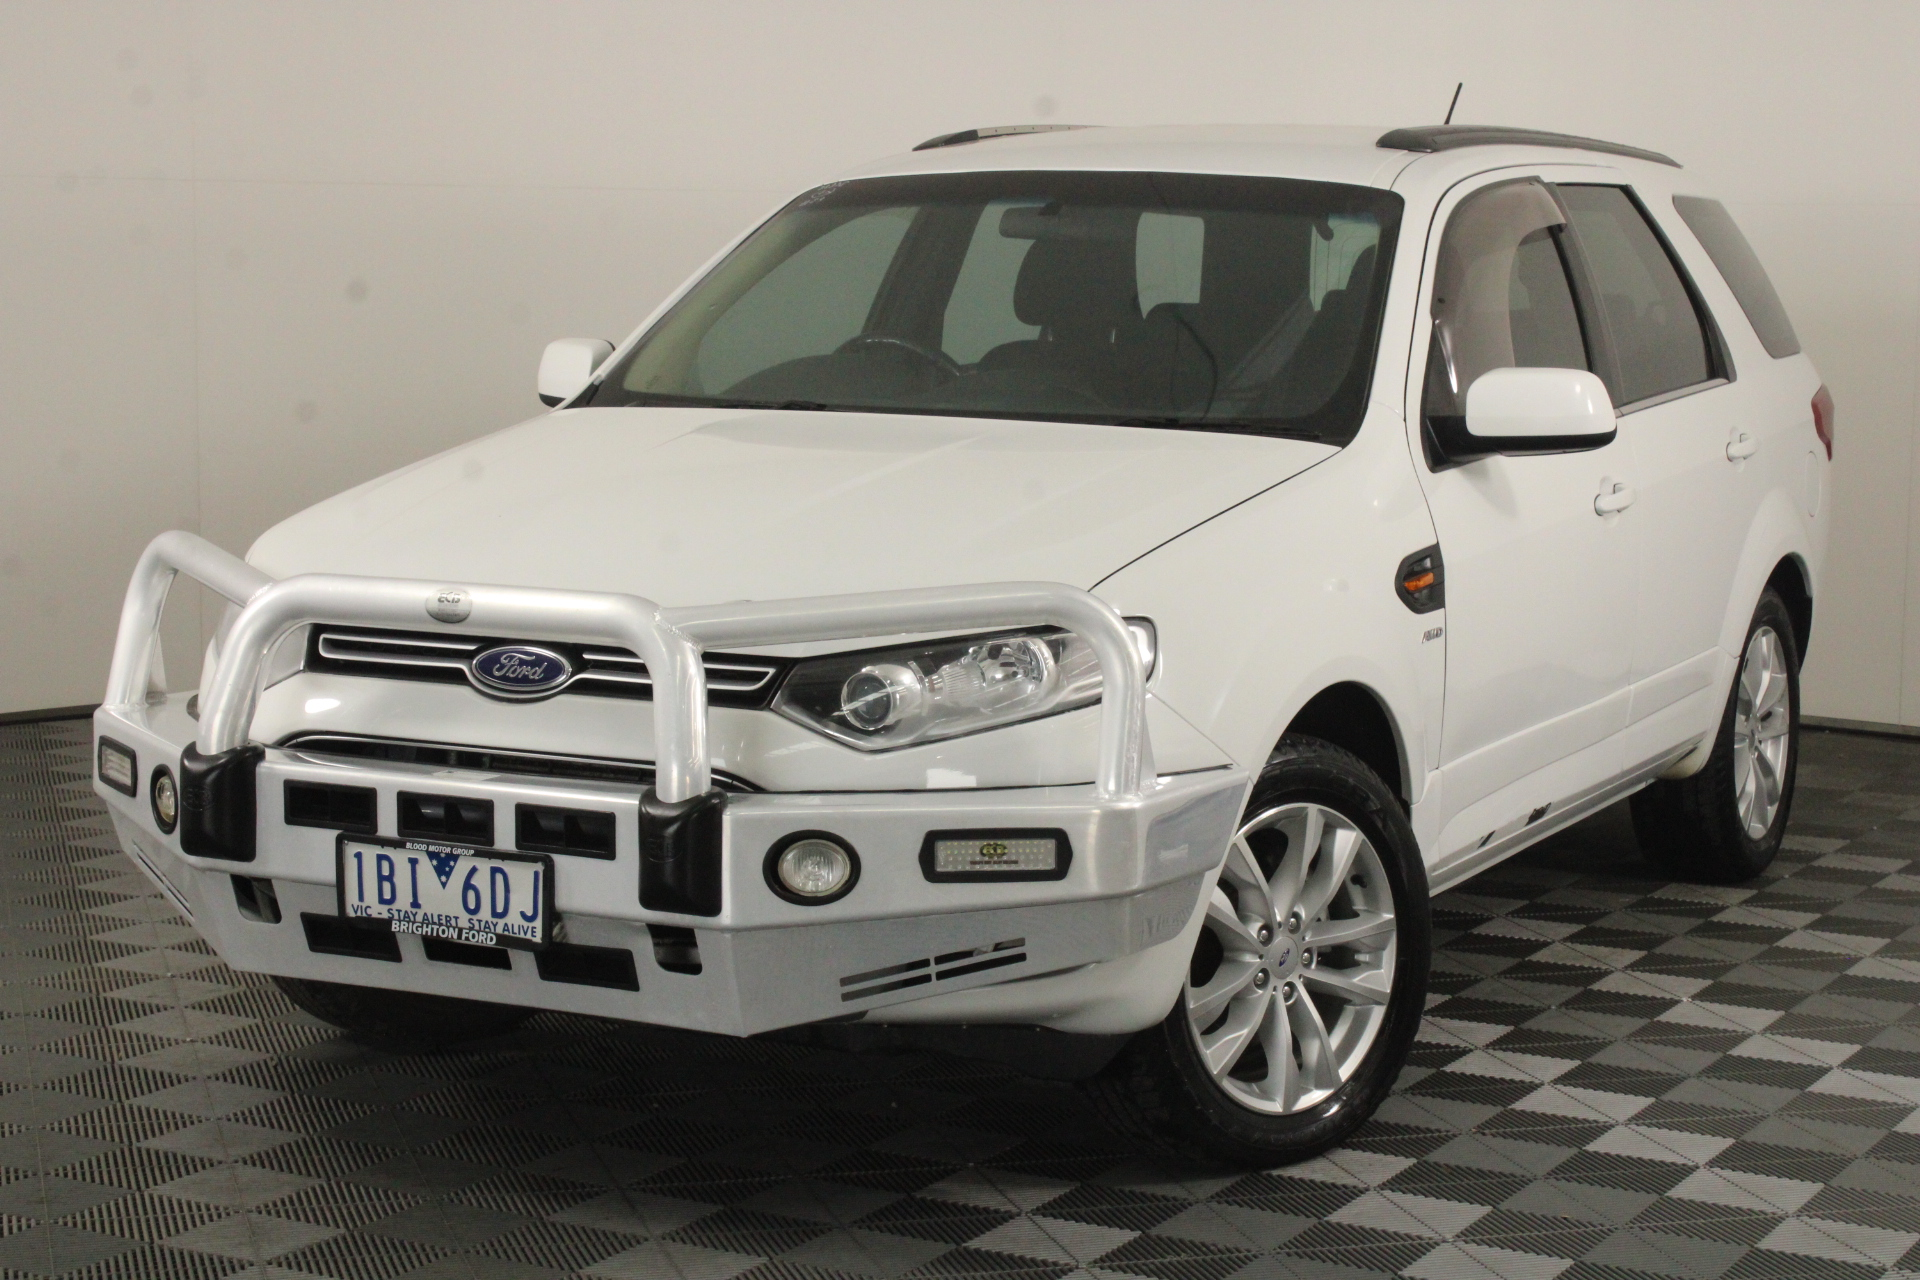 2014 Ford Territory TS (4x4) SZ Turbo Diesel Automatic 7 Seats Wagon